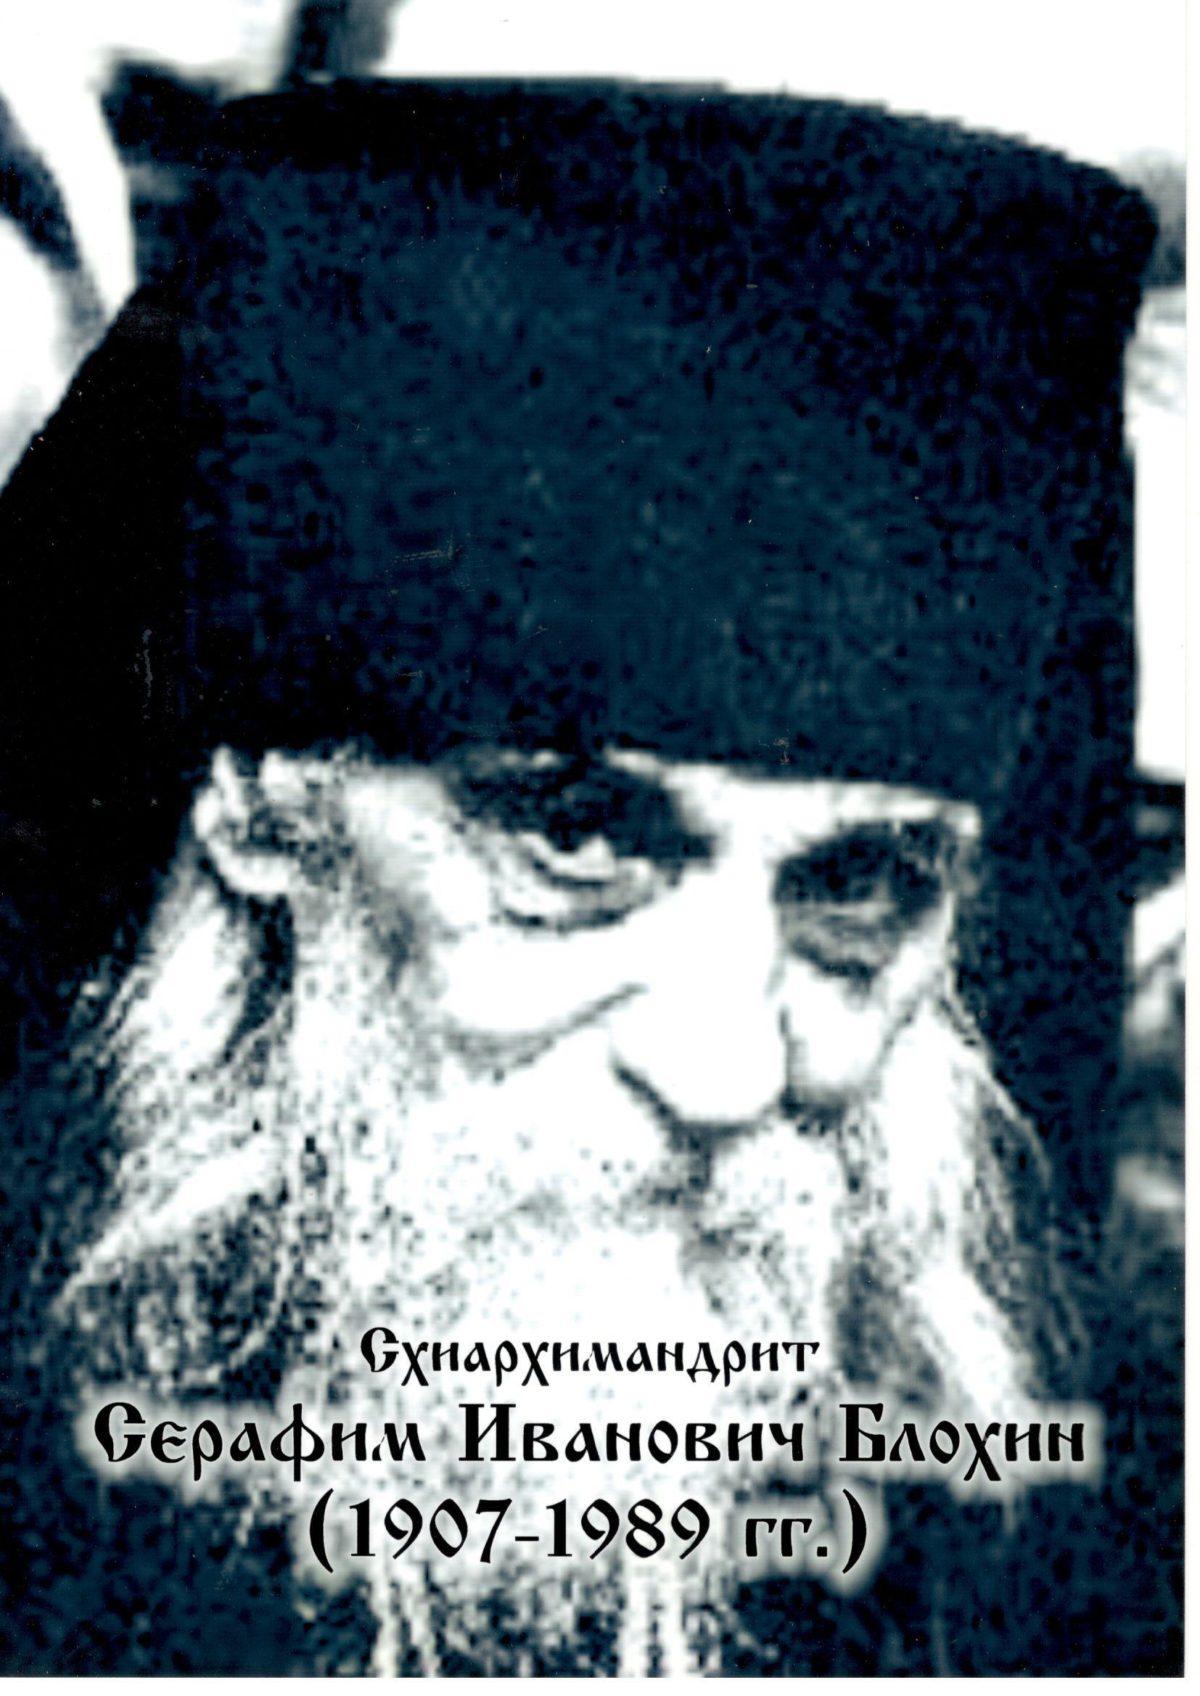 Схиархимандрит Серафим Блохин